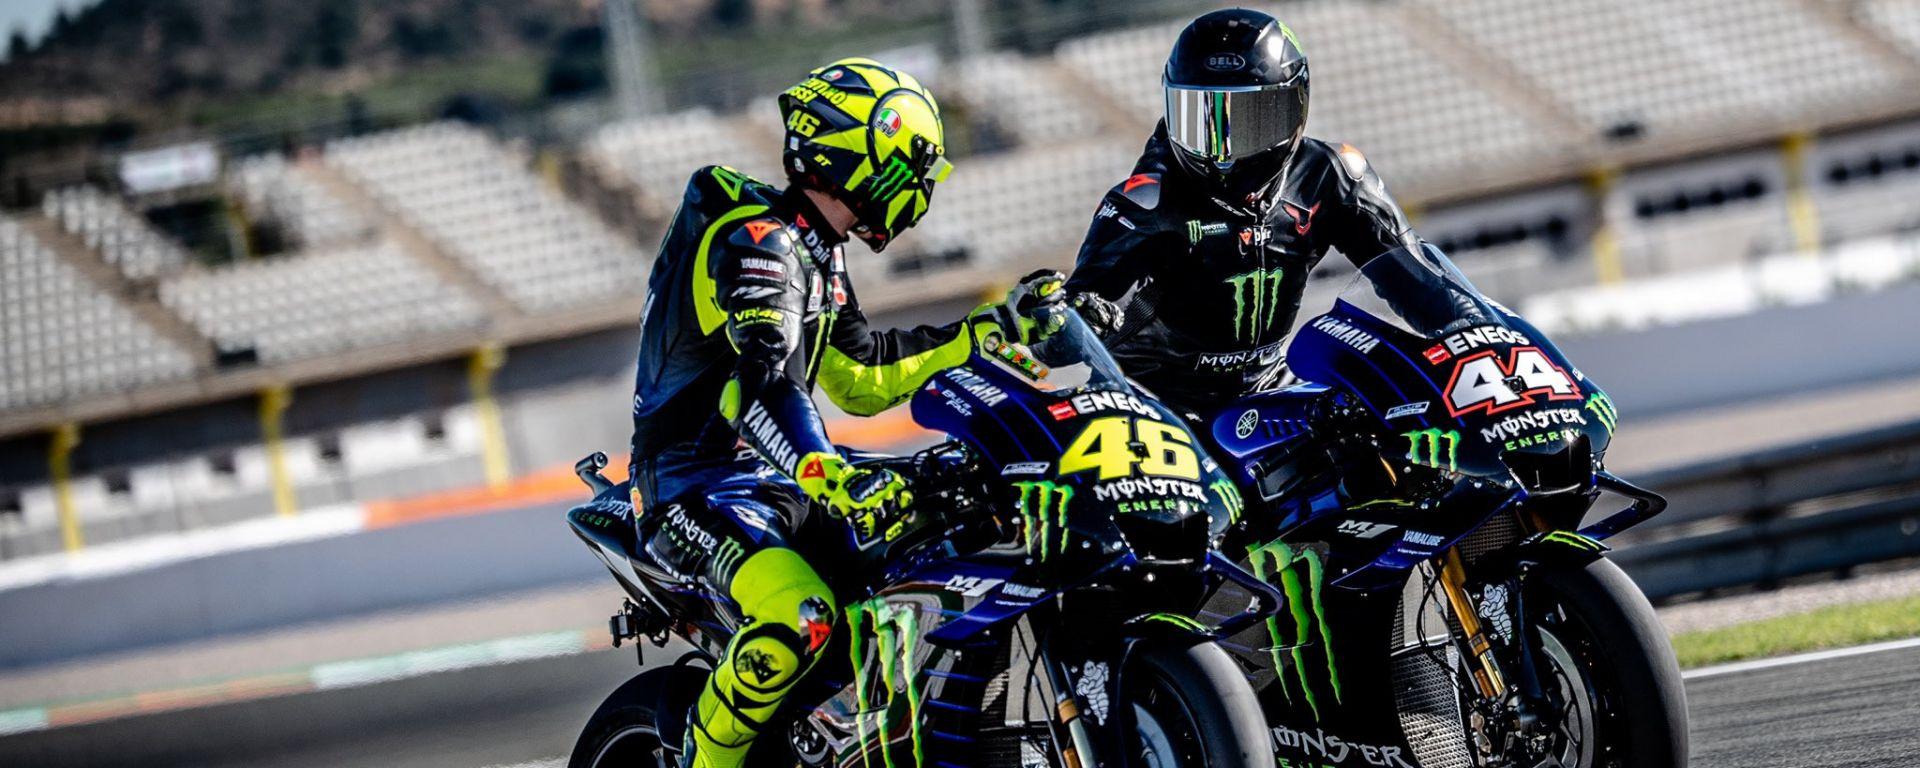 Valencia, Valentino Rossi e Lewis Hamilton sulla Yamaha M1 MotoGP